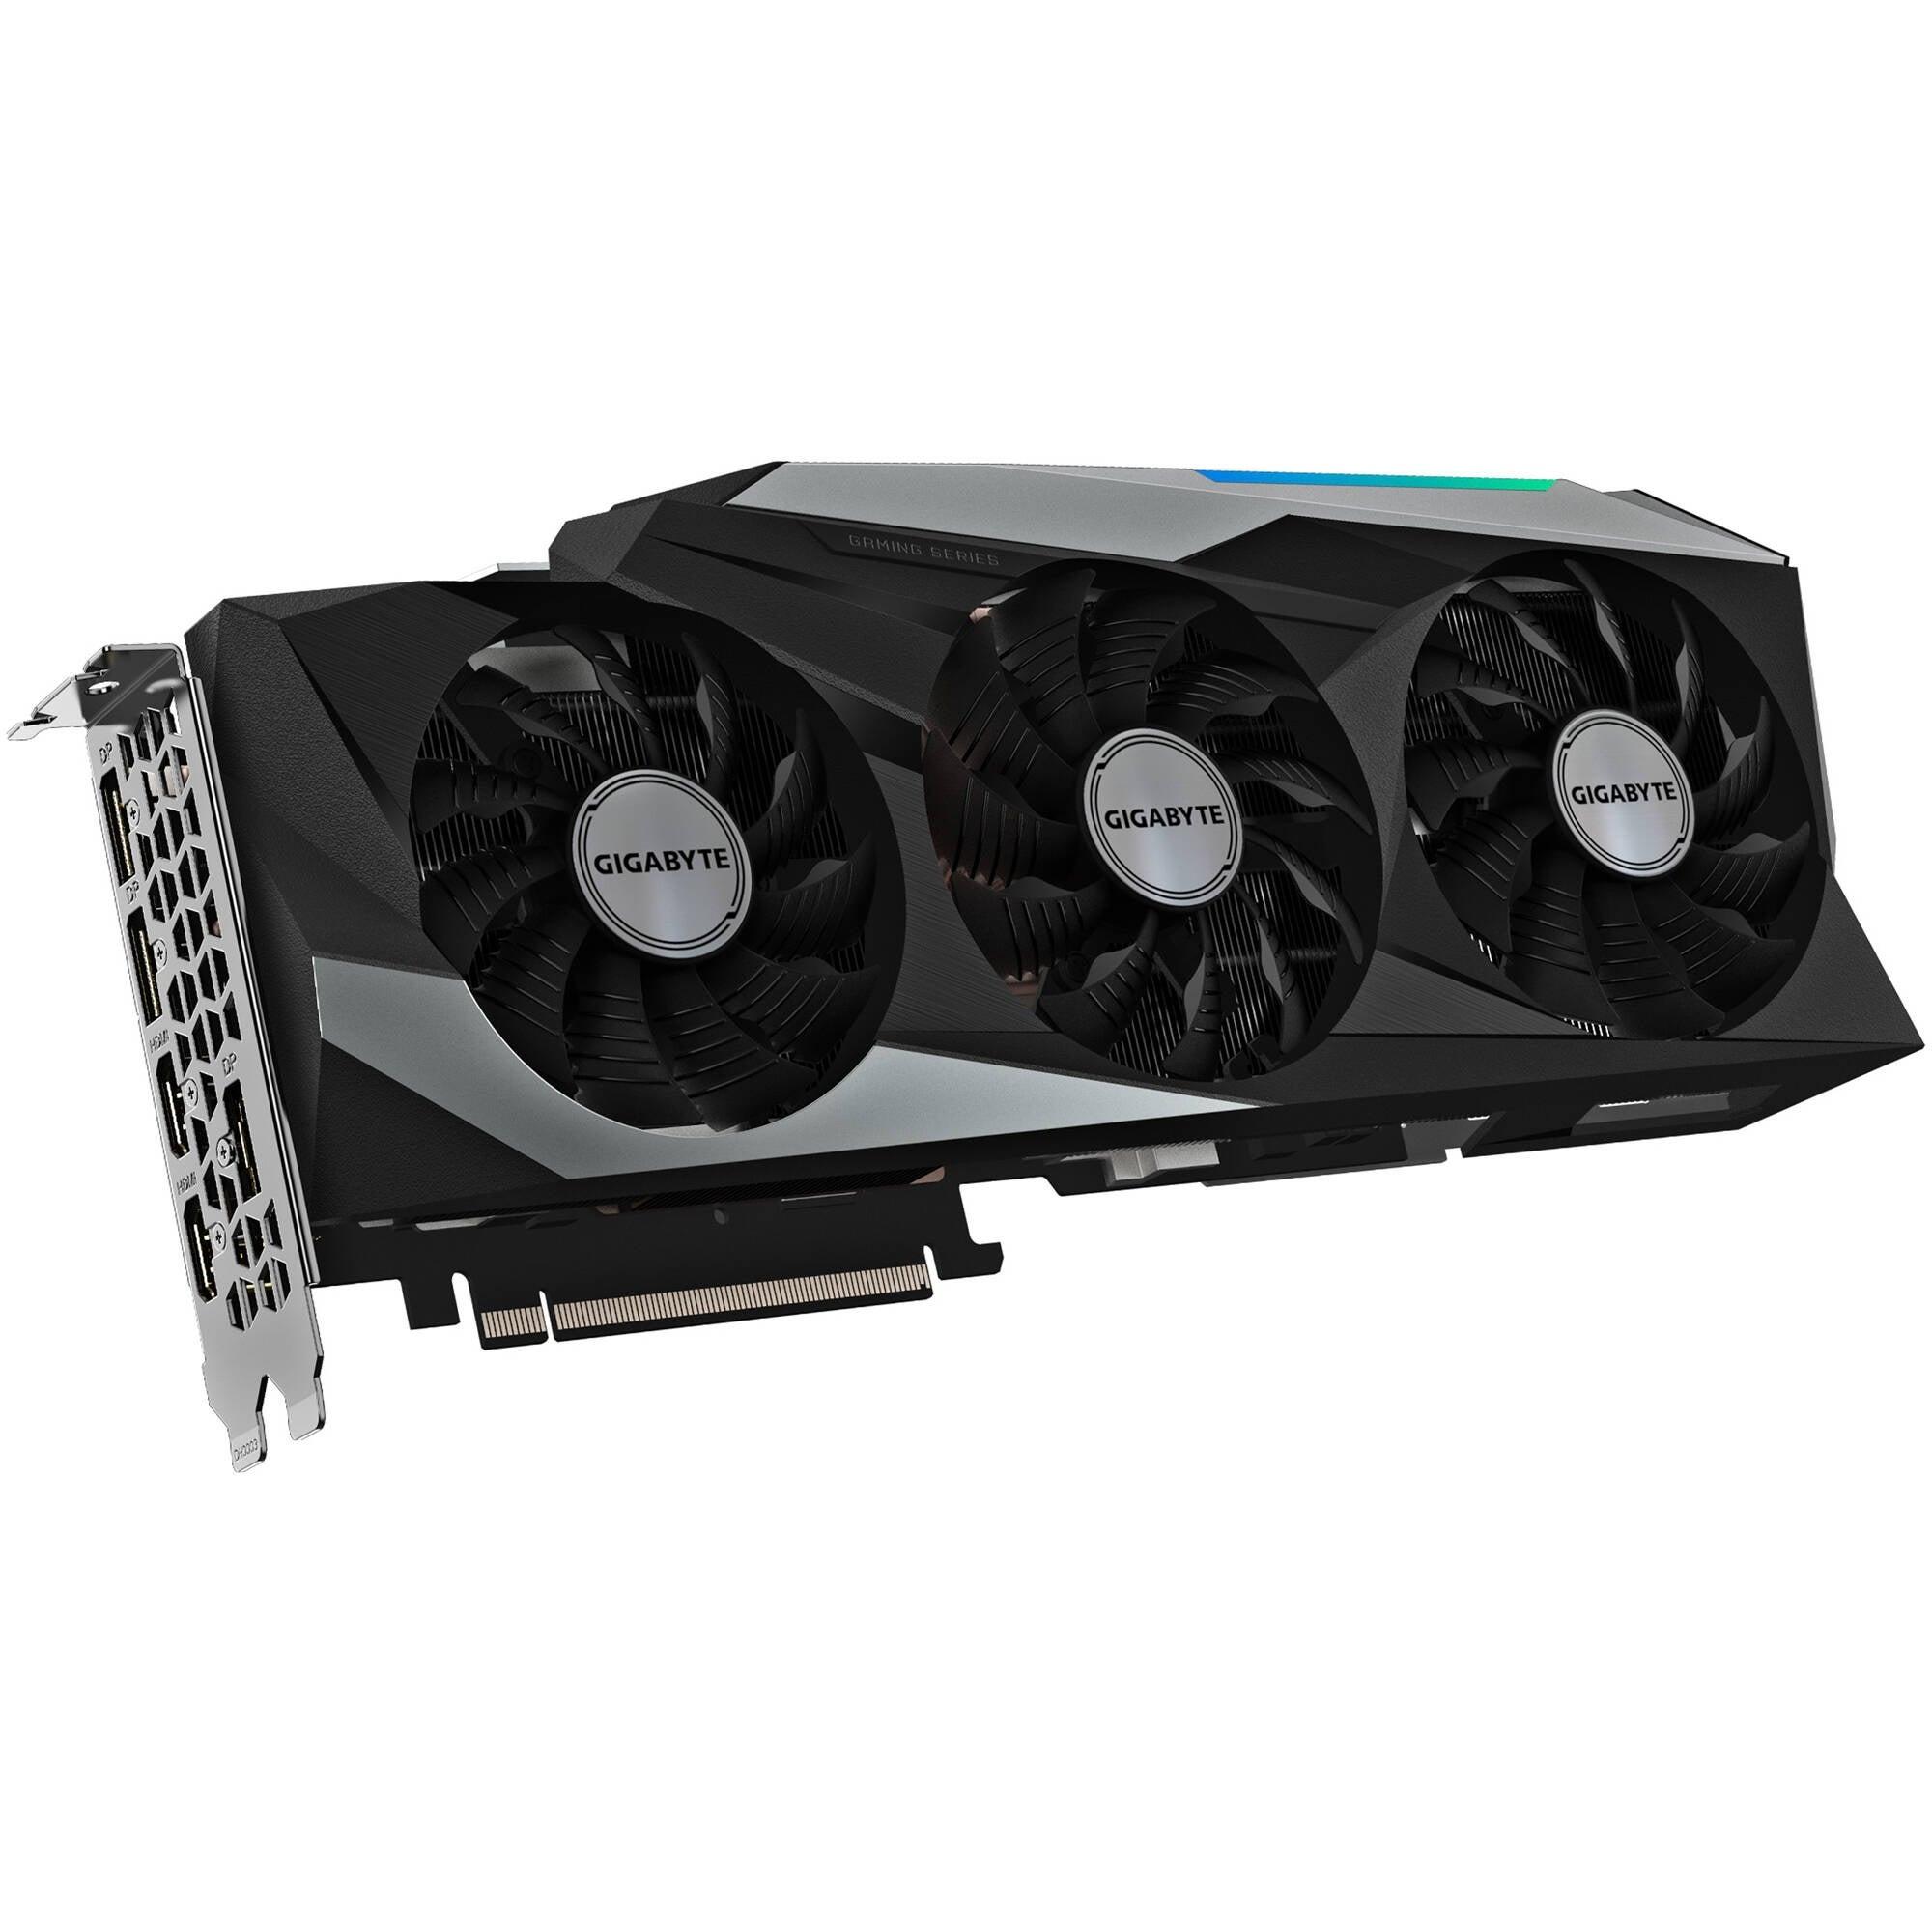 Gigabyte GeForce RTX 3090 Gaming OC Graphics Card